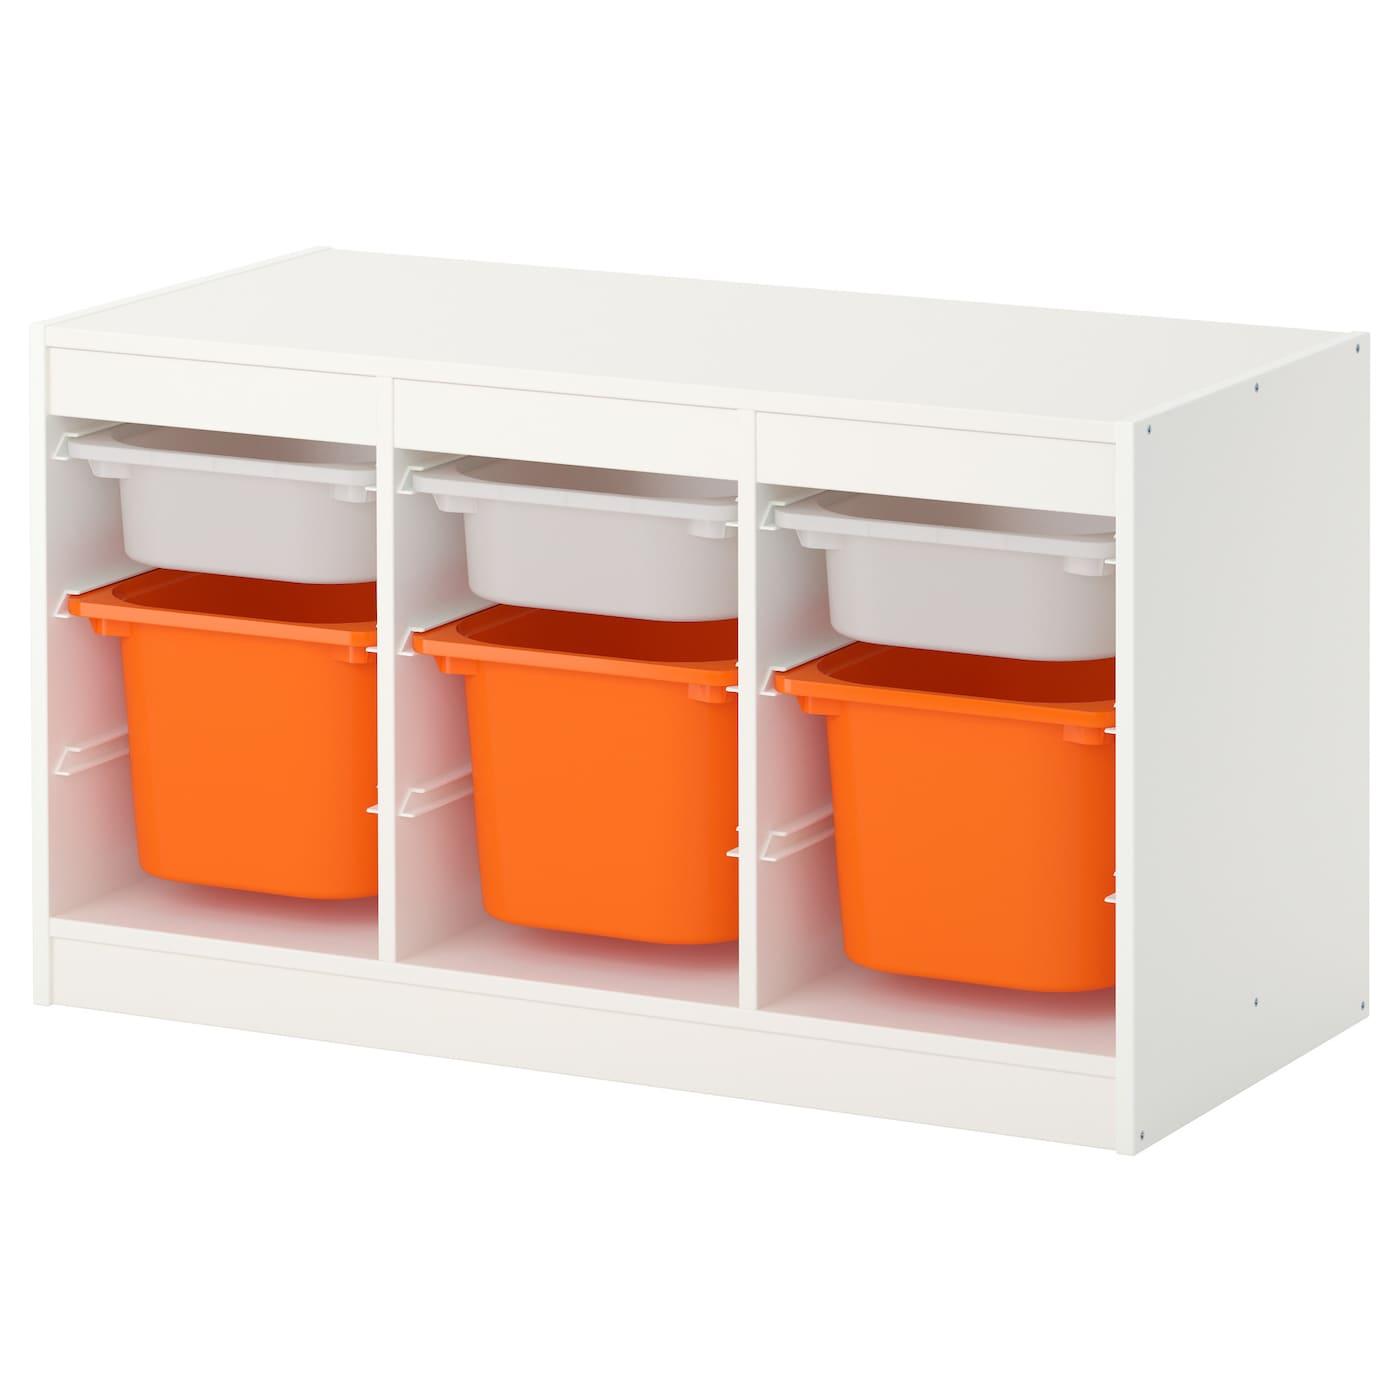 TROFAST Storage bination with boxes White orange 99x56x44 cm IKEA